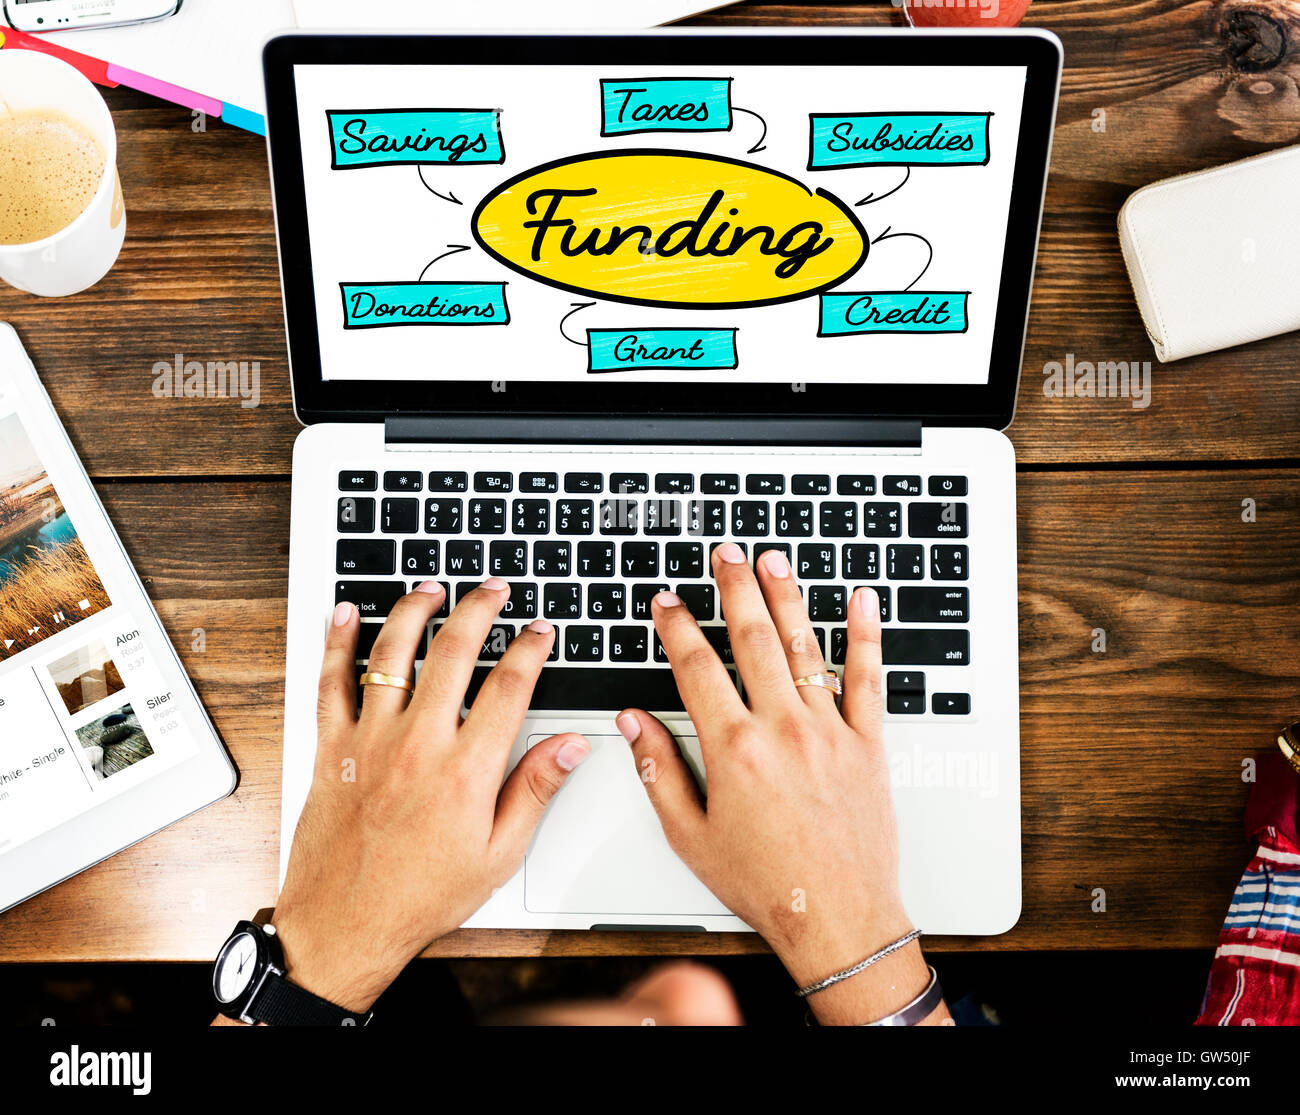 Funding Grant Donation Diagram Concept - Stock Image